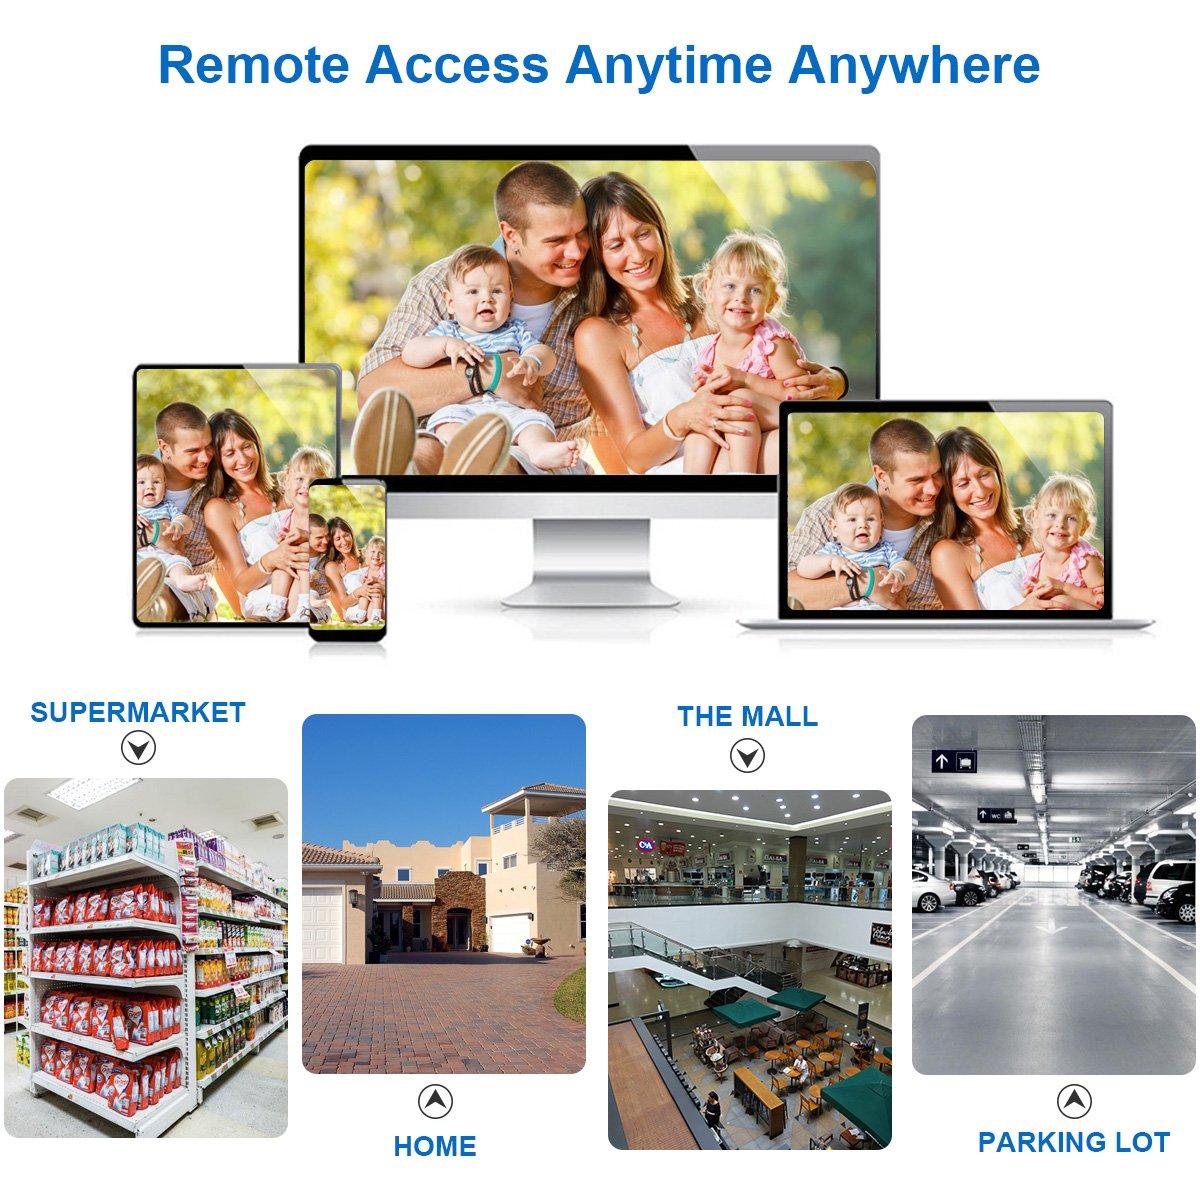 FLOUREON Videoüberwachung 8CH AHD 1080N DVR + 8X 3000TVL 2.0MP Überwachungskamera (3000TVL+ 8 Kameras)